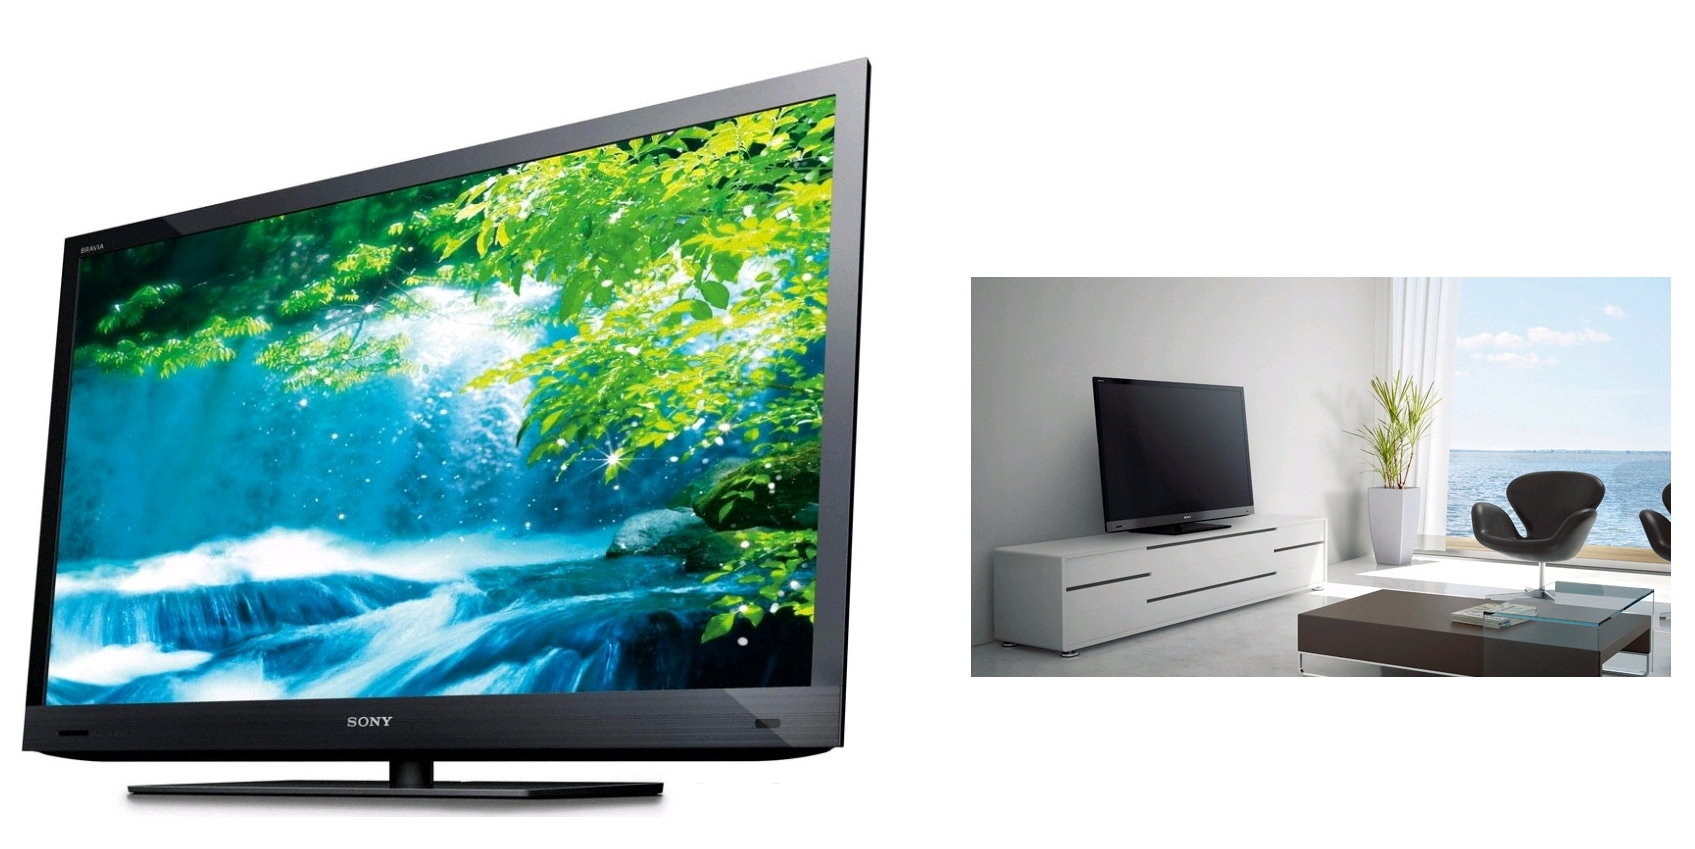 sony-lcd-tv